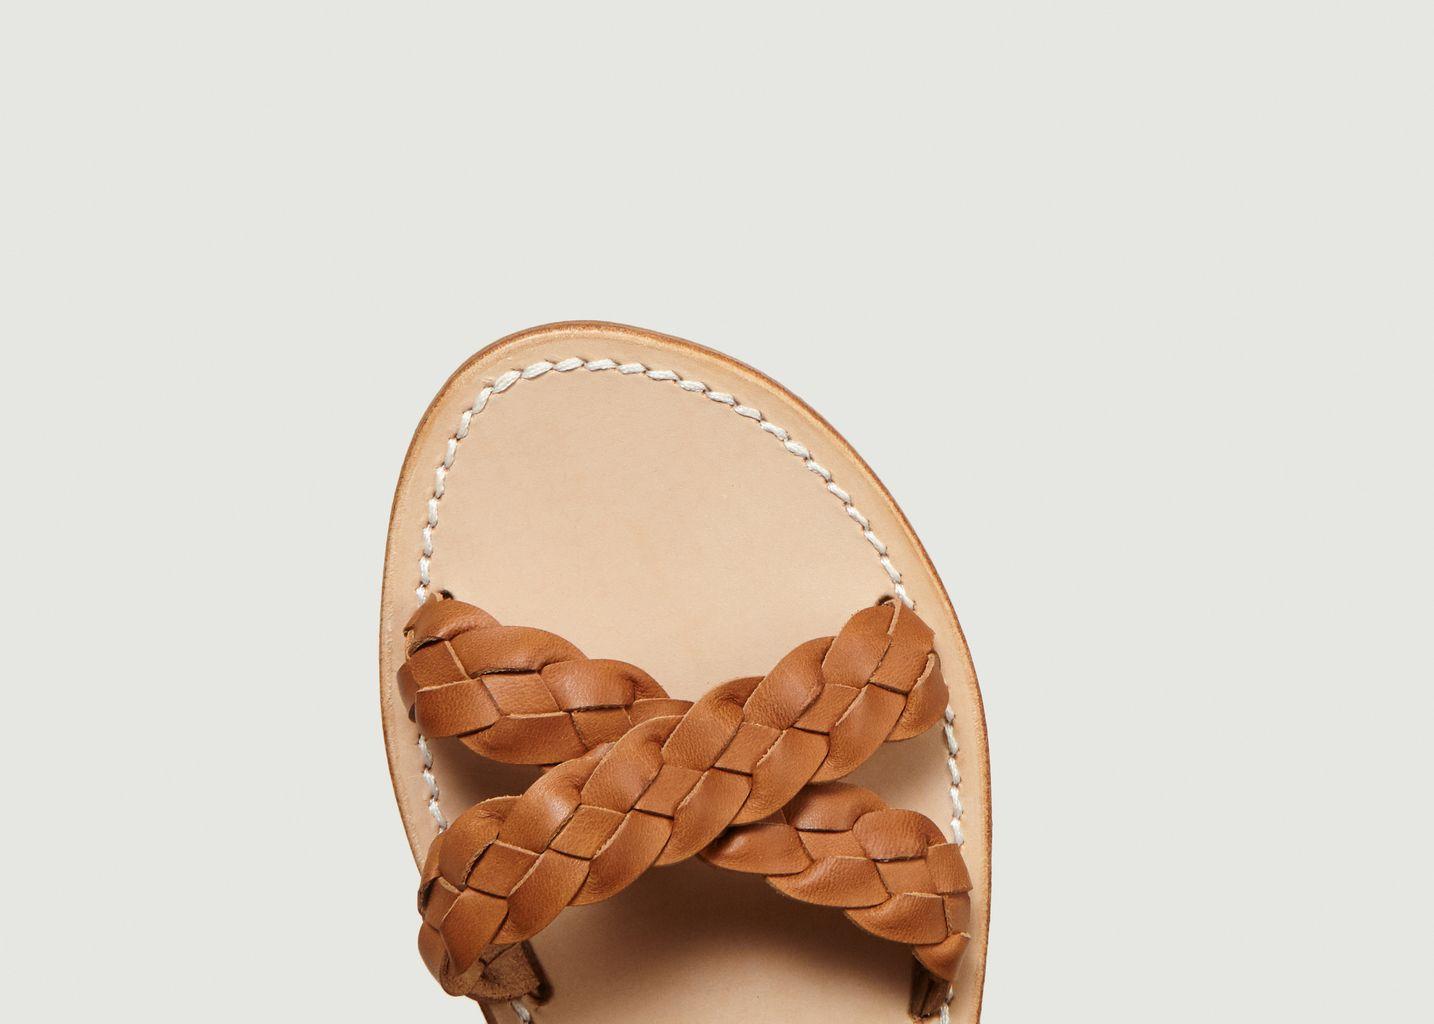 Sandales Criss Cross - La Botte Gardiane